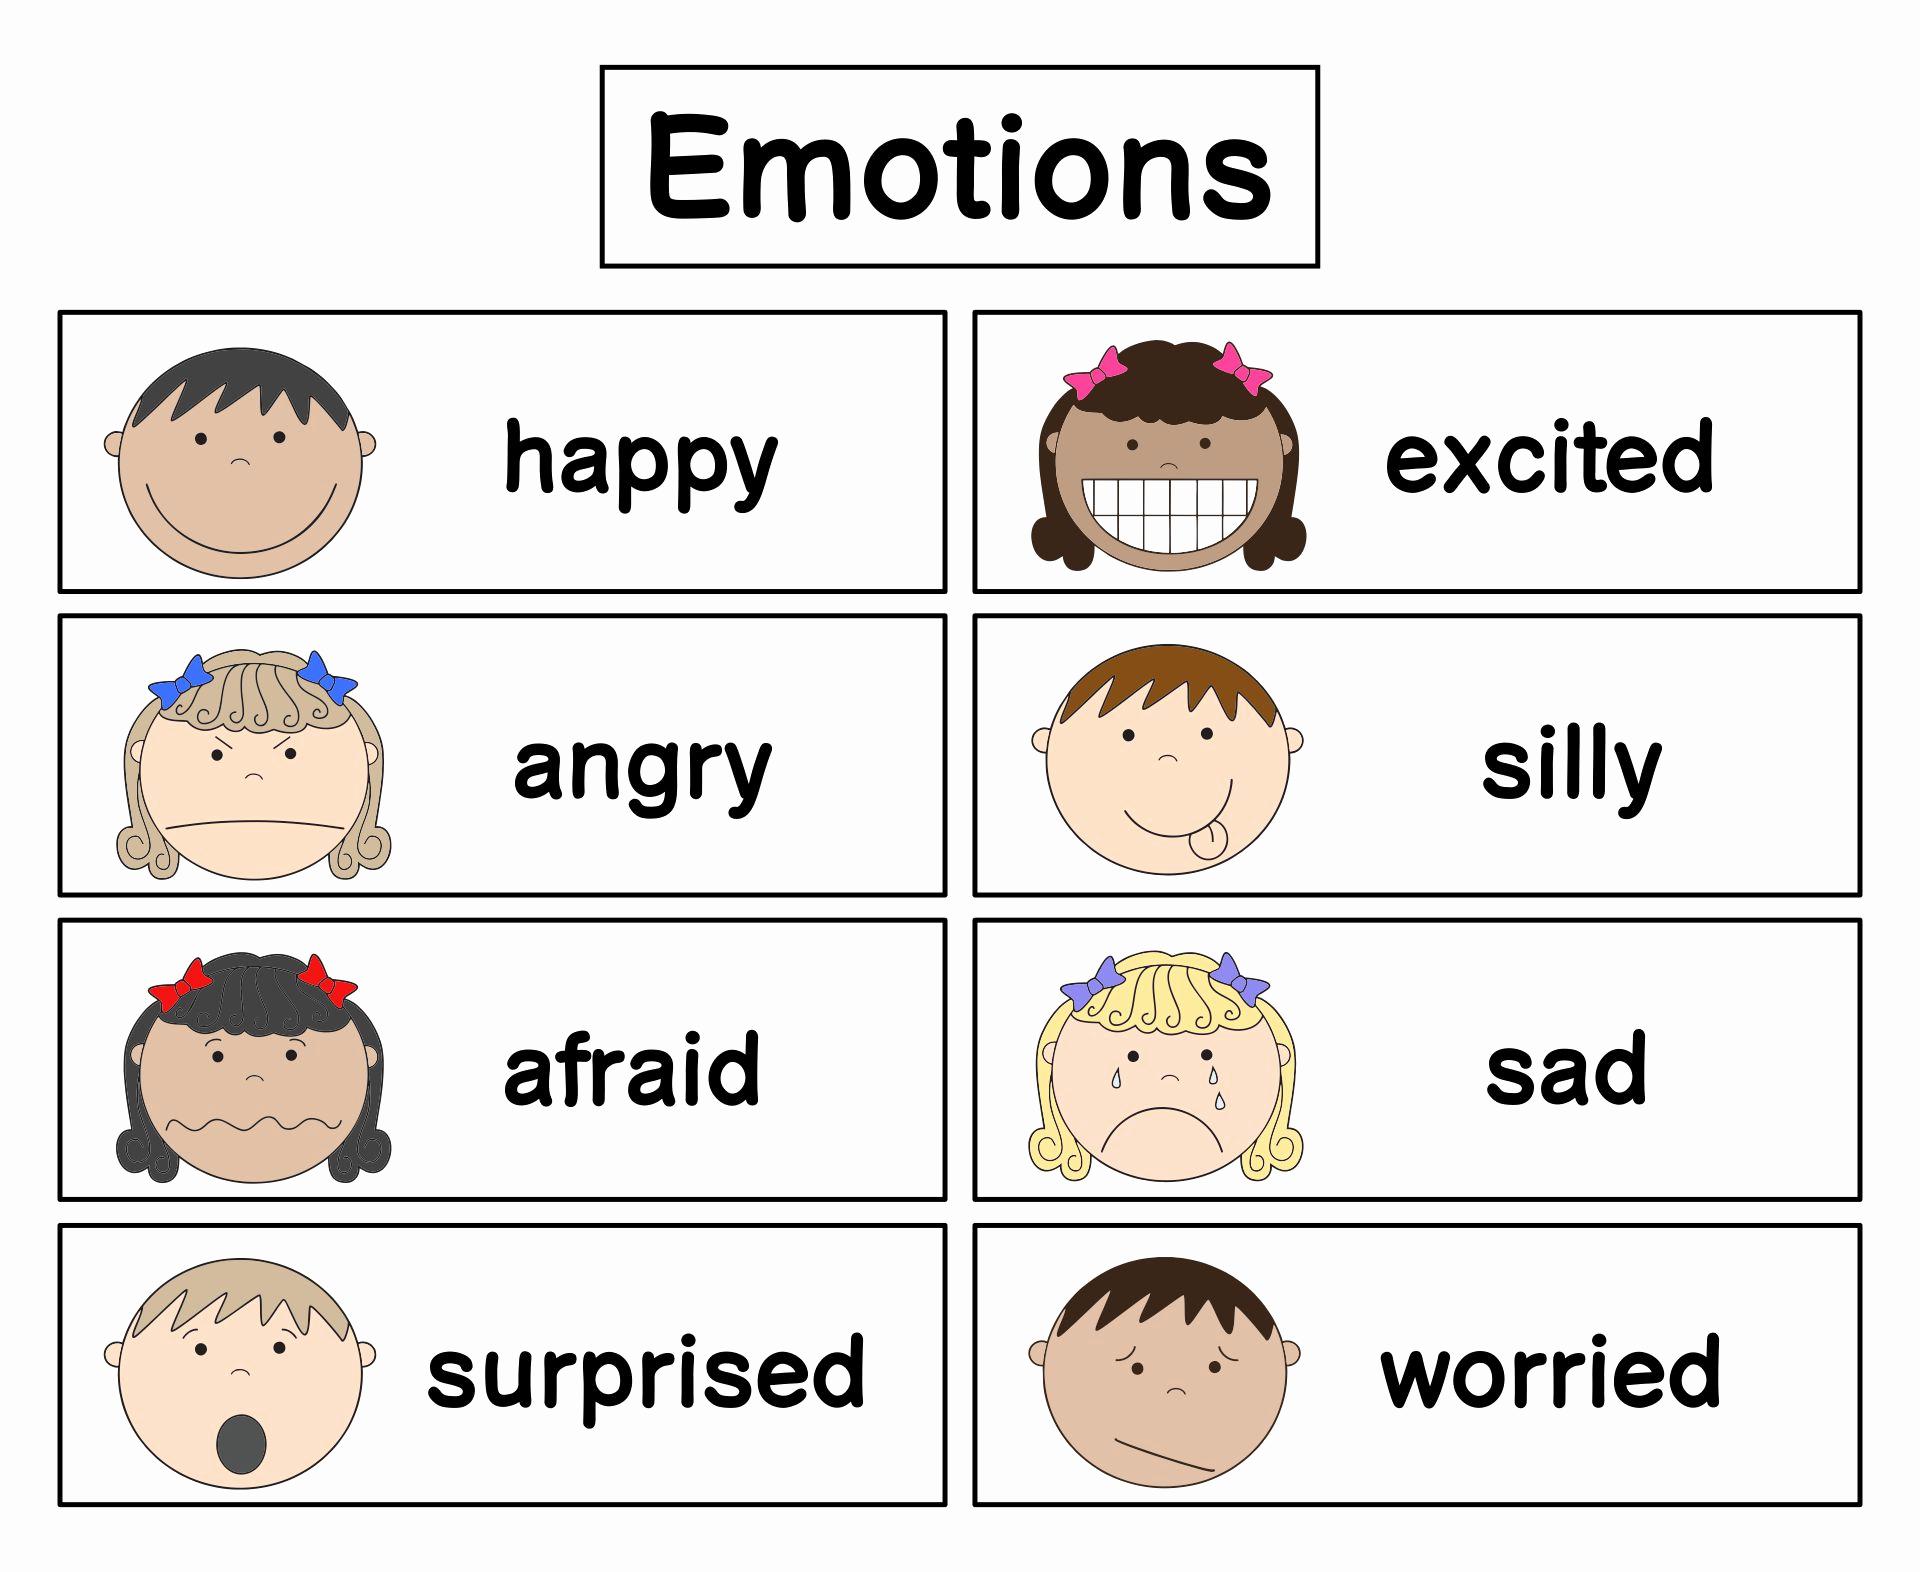 Emotions Worksheets for Preschoolers Awesome 7 Best Printable Emotion Cards Printablee